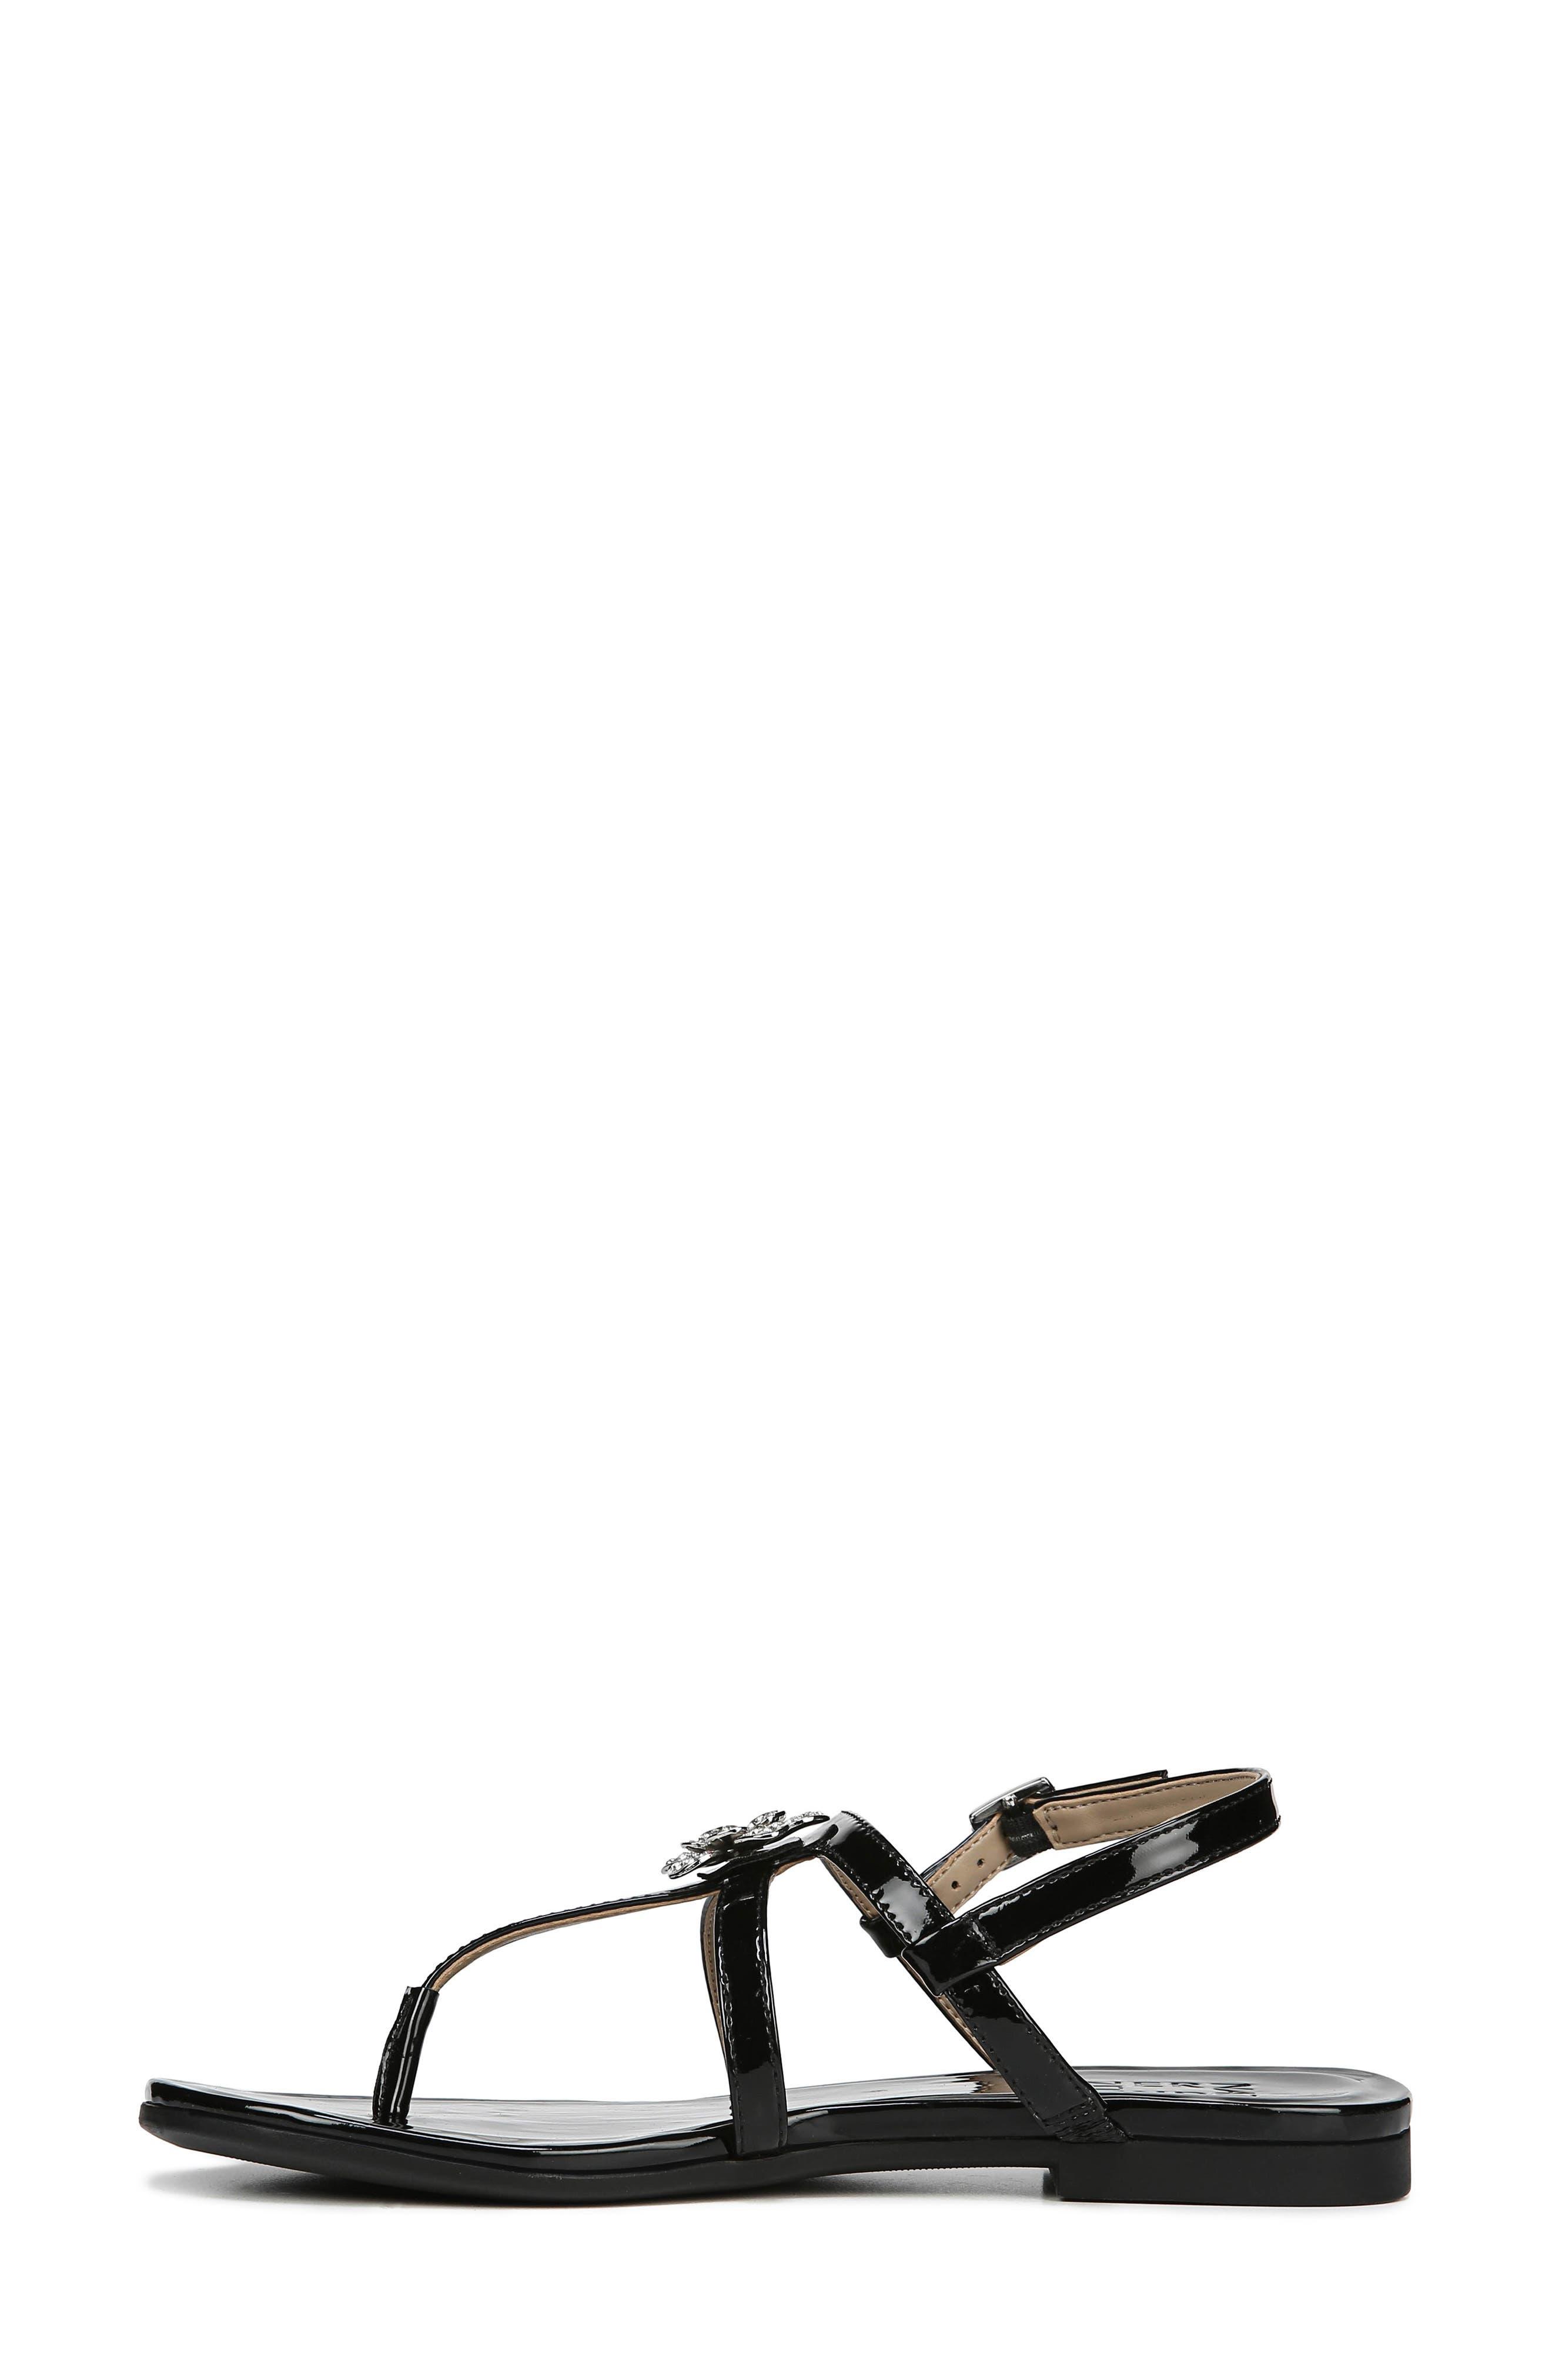 Tilly Embellished Sandal,                             Alternate thumbnail 9, color,                             BLACK PATENT FAUX LEATHER